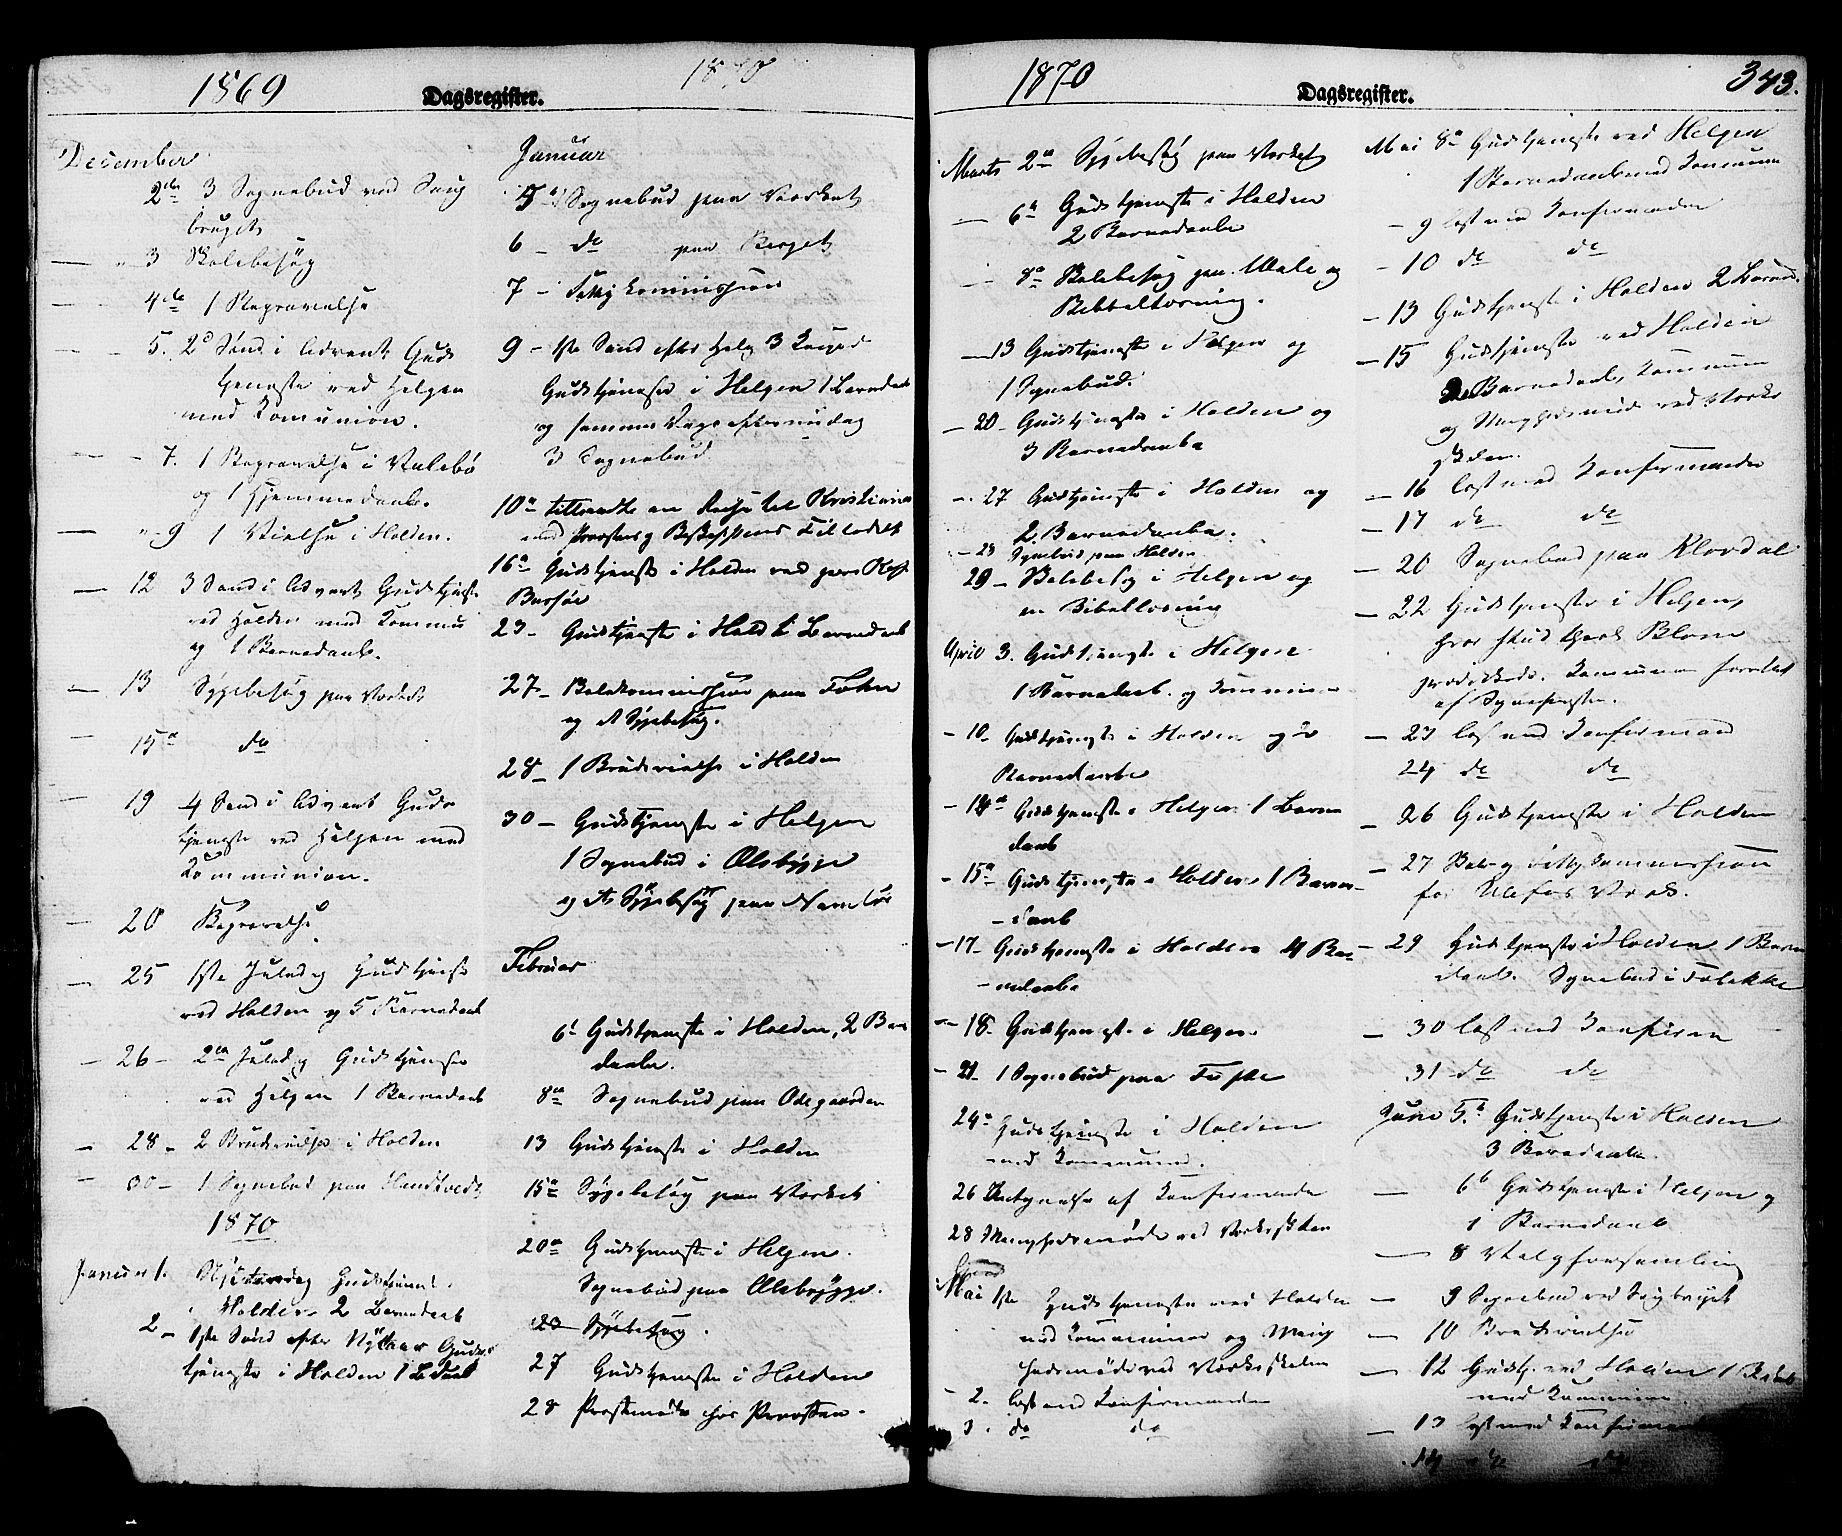 SAKO, Holla kirkebøker, F/Fa/L0007: Ministerialbok nr. 7, 1869-1881, s. 343